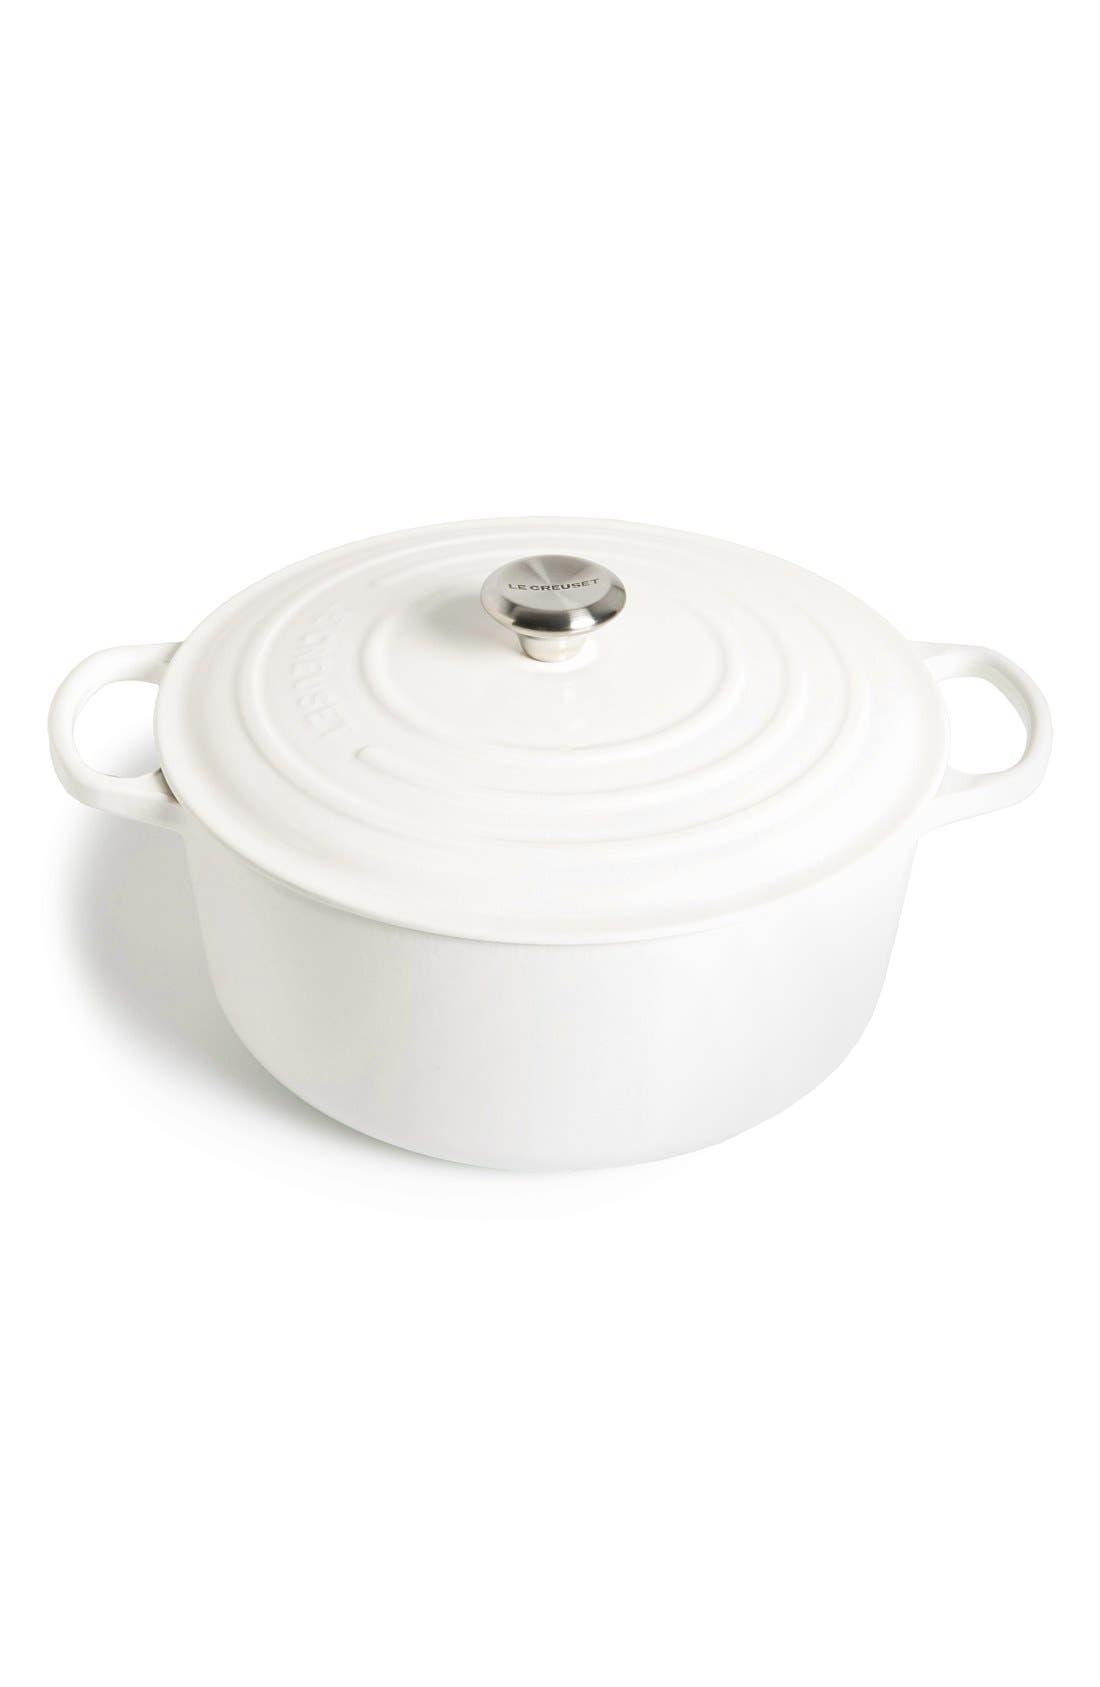 Signature 9 Quart Round Enamel Cast Iron French/Dutch Oven,                         Main,                         color, White